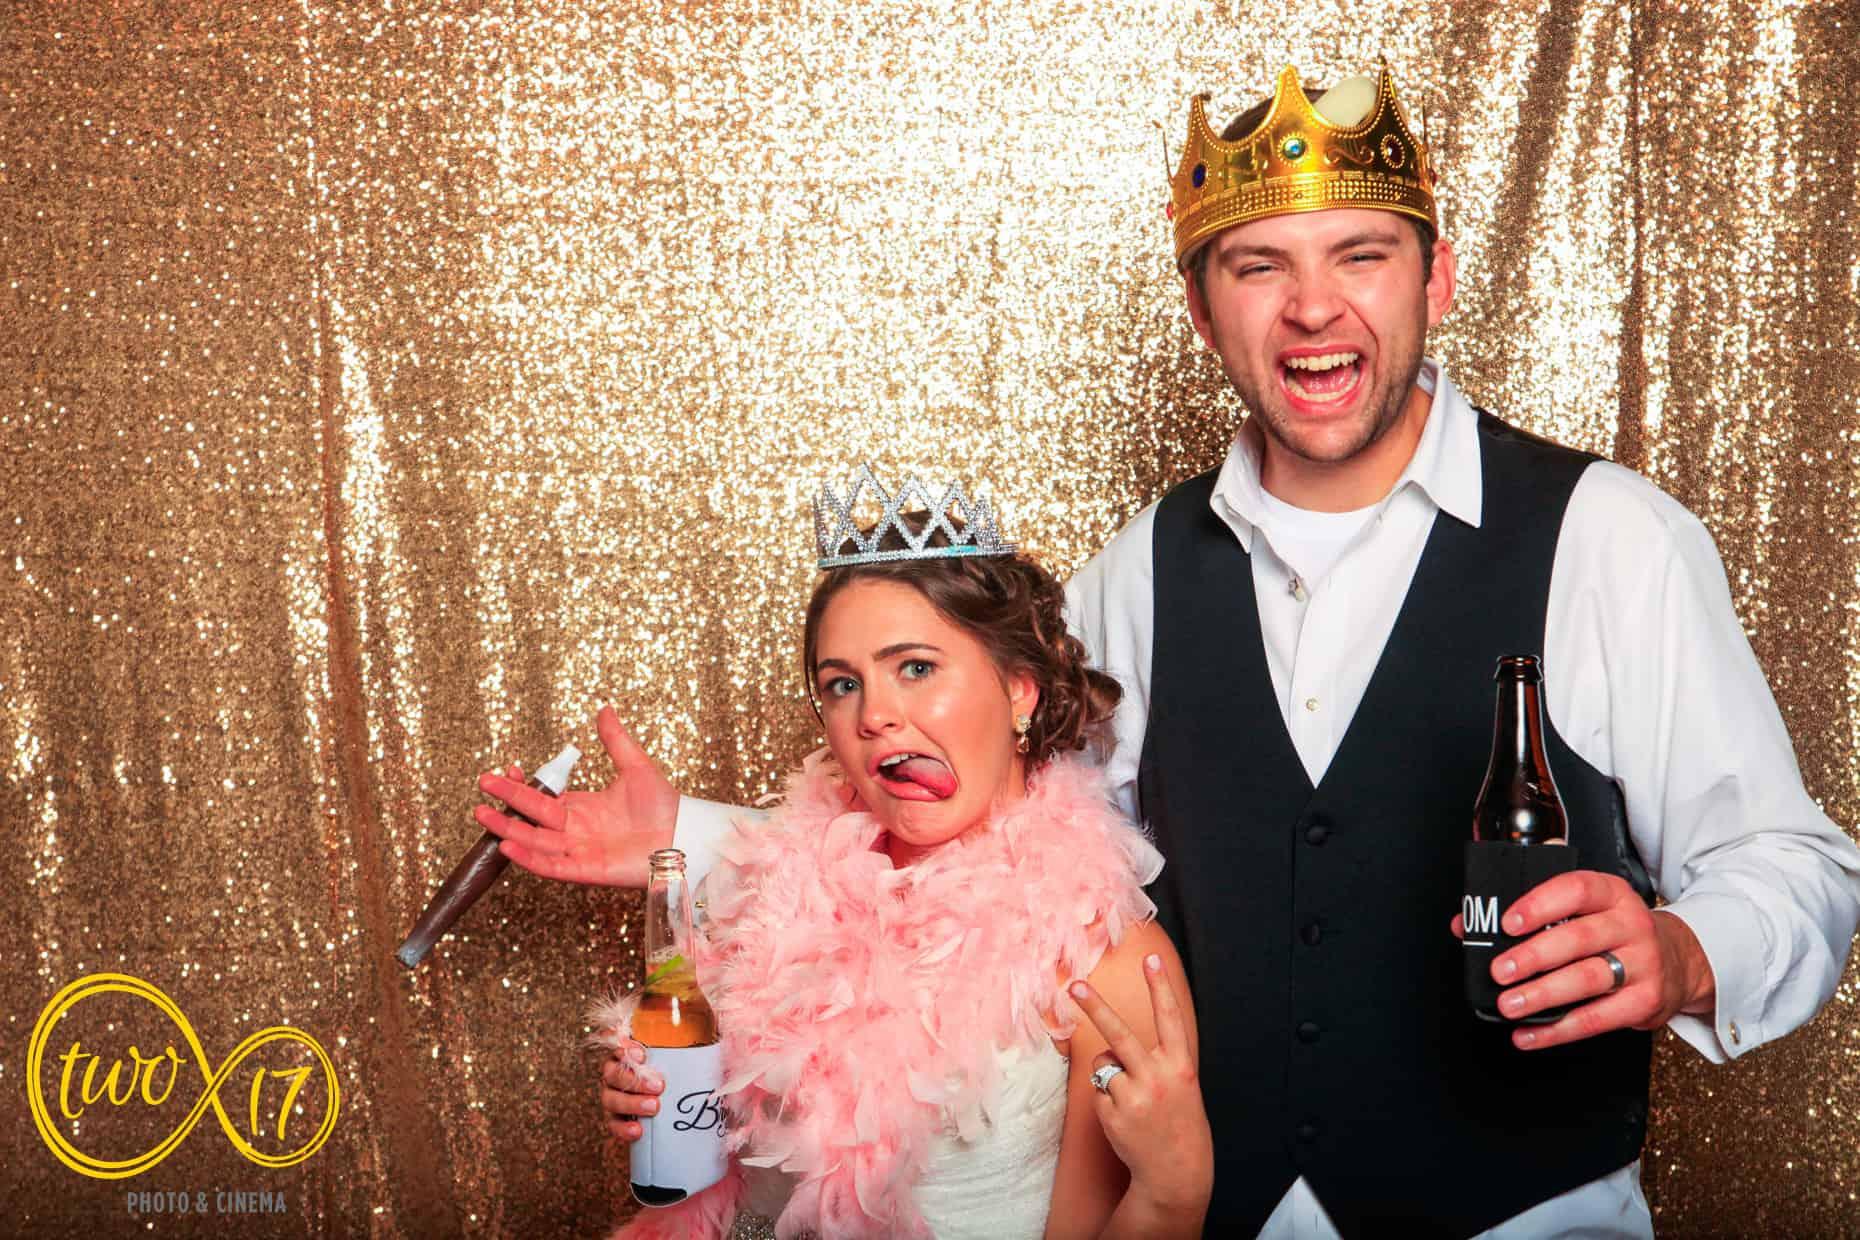 Philadelphia Wedding Photo Booth Rentals